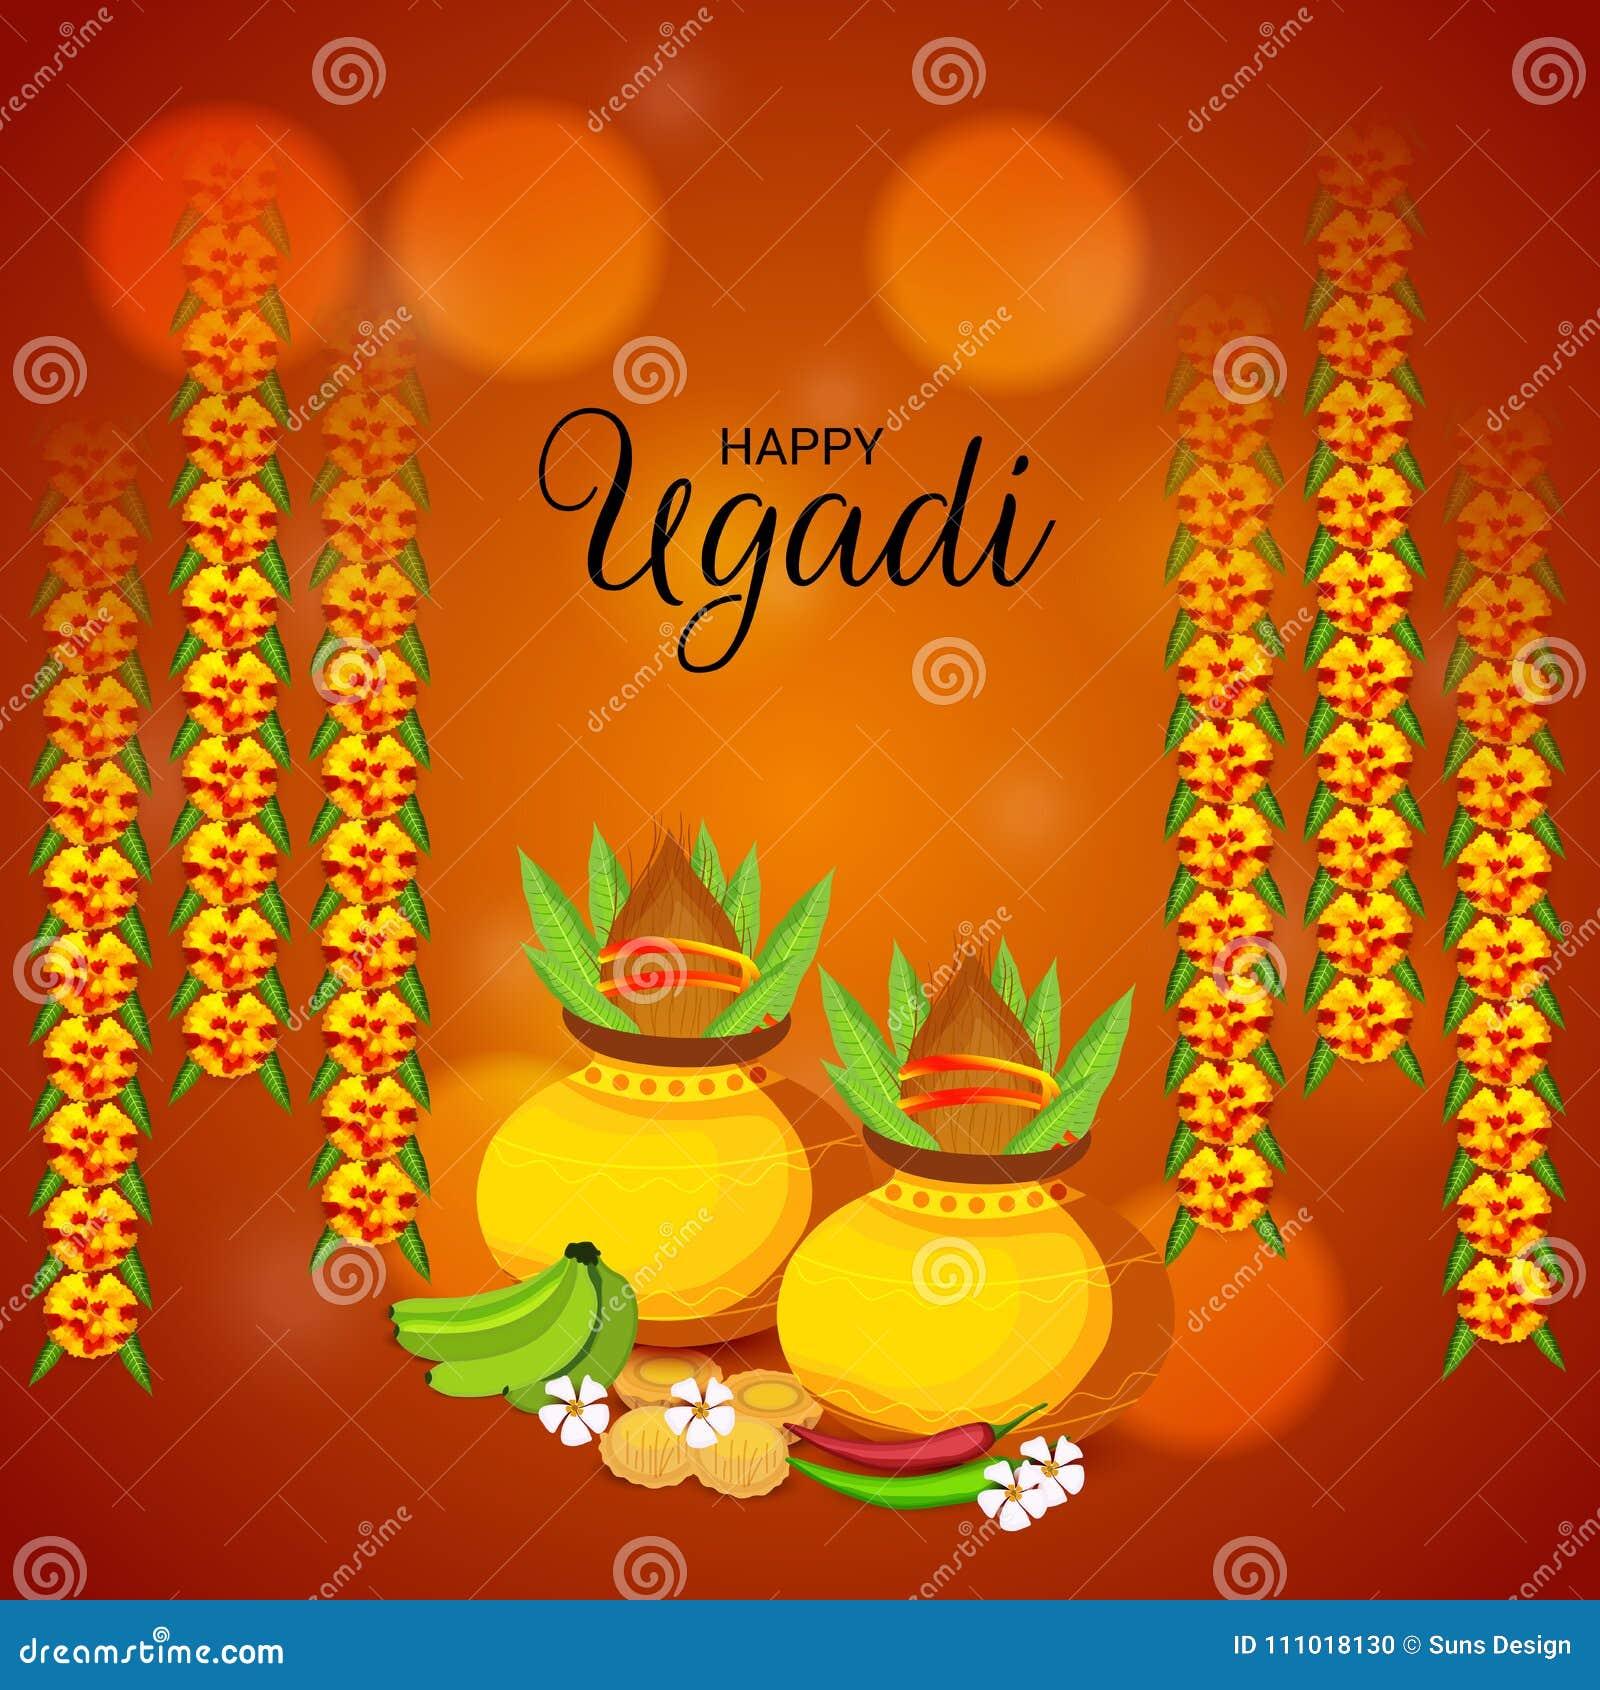 Happy Ugadi Hindu New Year.